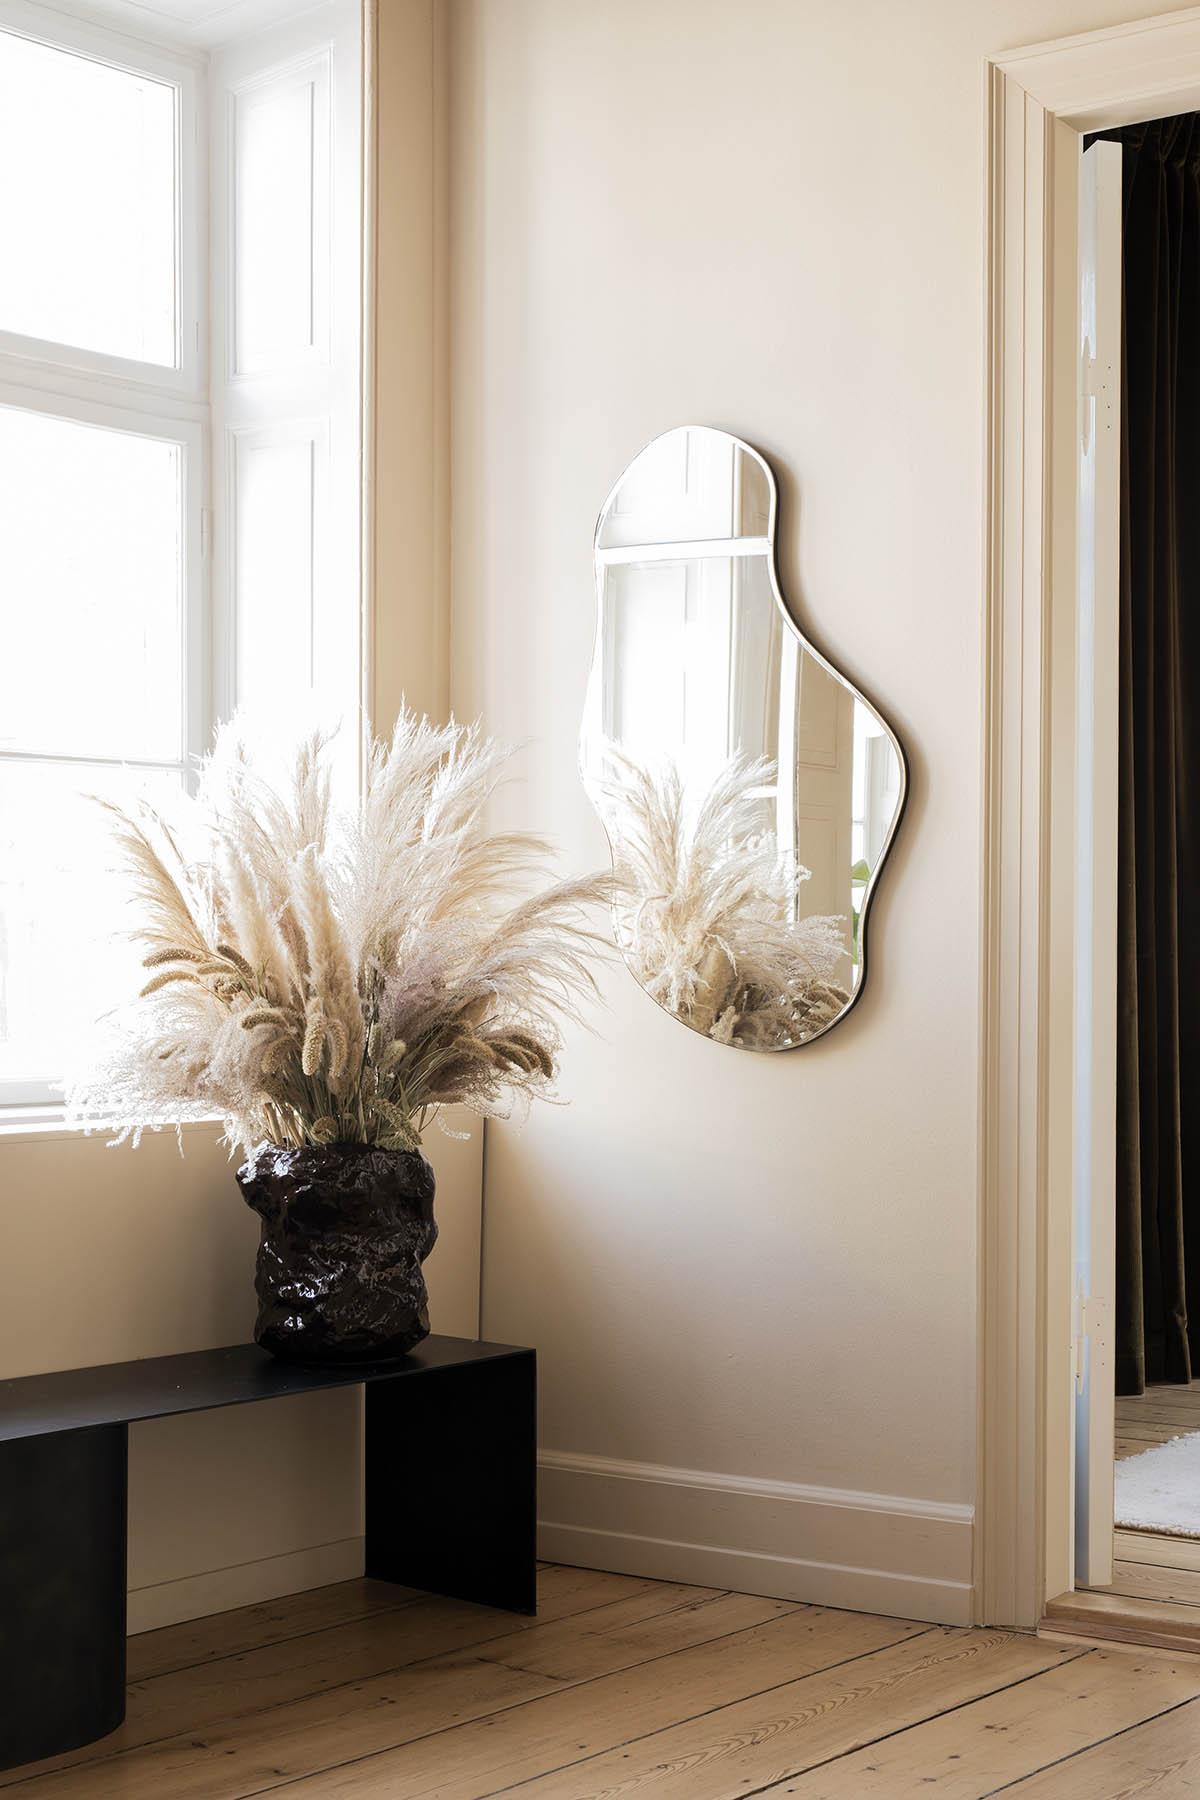 Ferm Living Pond Mirror in a minimal home